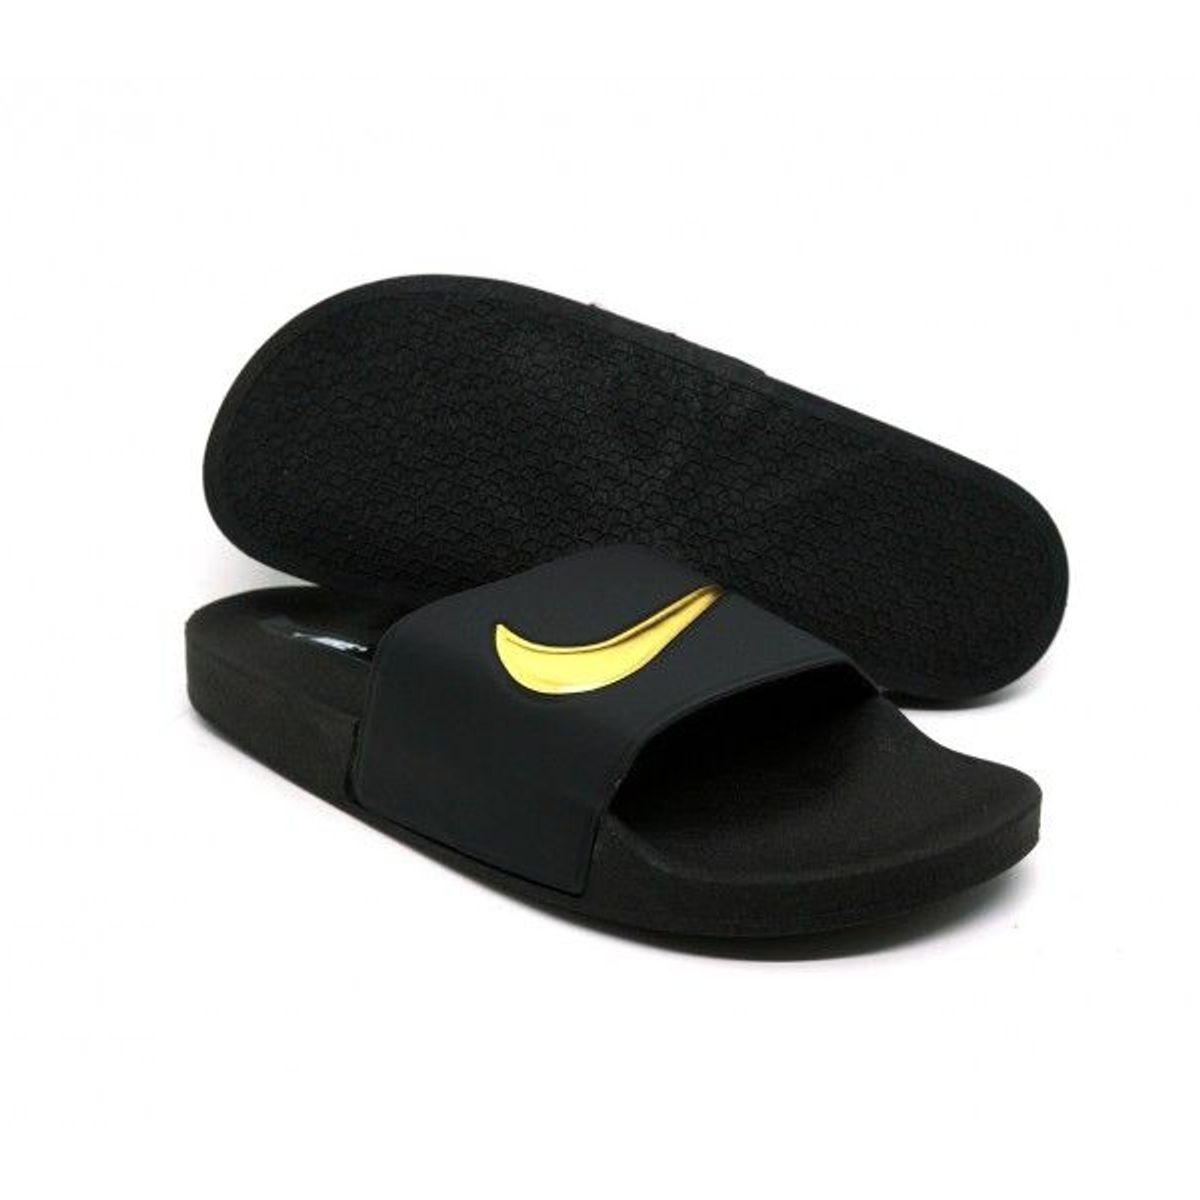 0d69b8e03c Chinelo Nike Slide Tira Larga Preto e Dourado | Sandália Masculina Nike  Nunca Usado 34466653 | enjoei